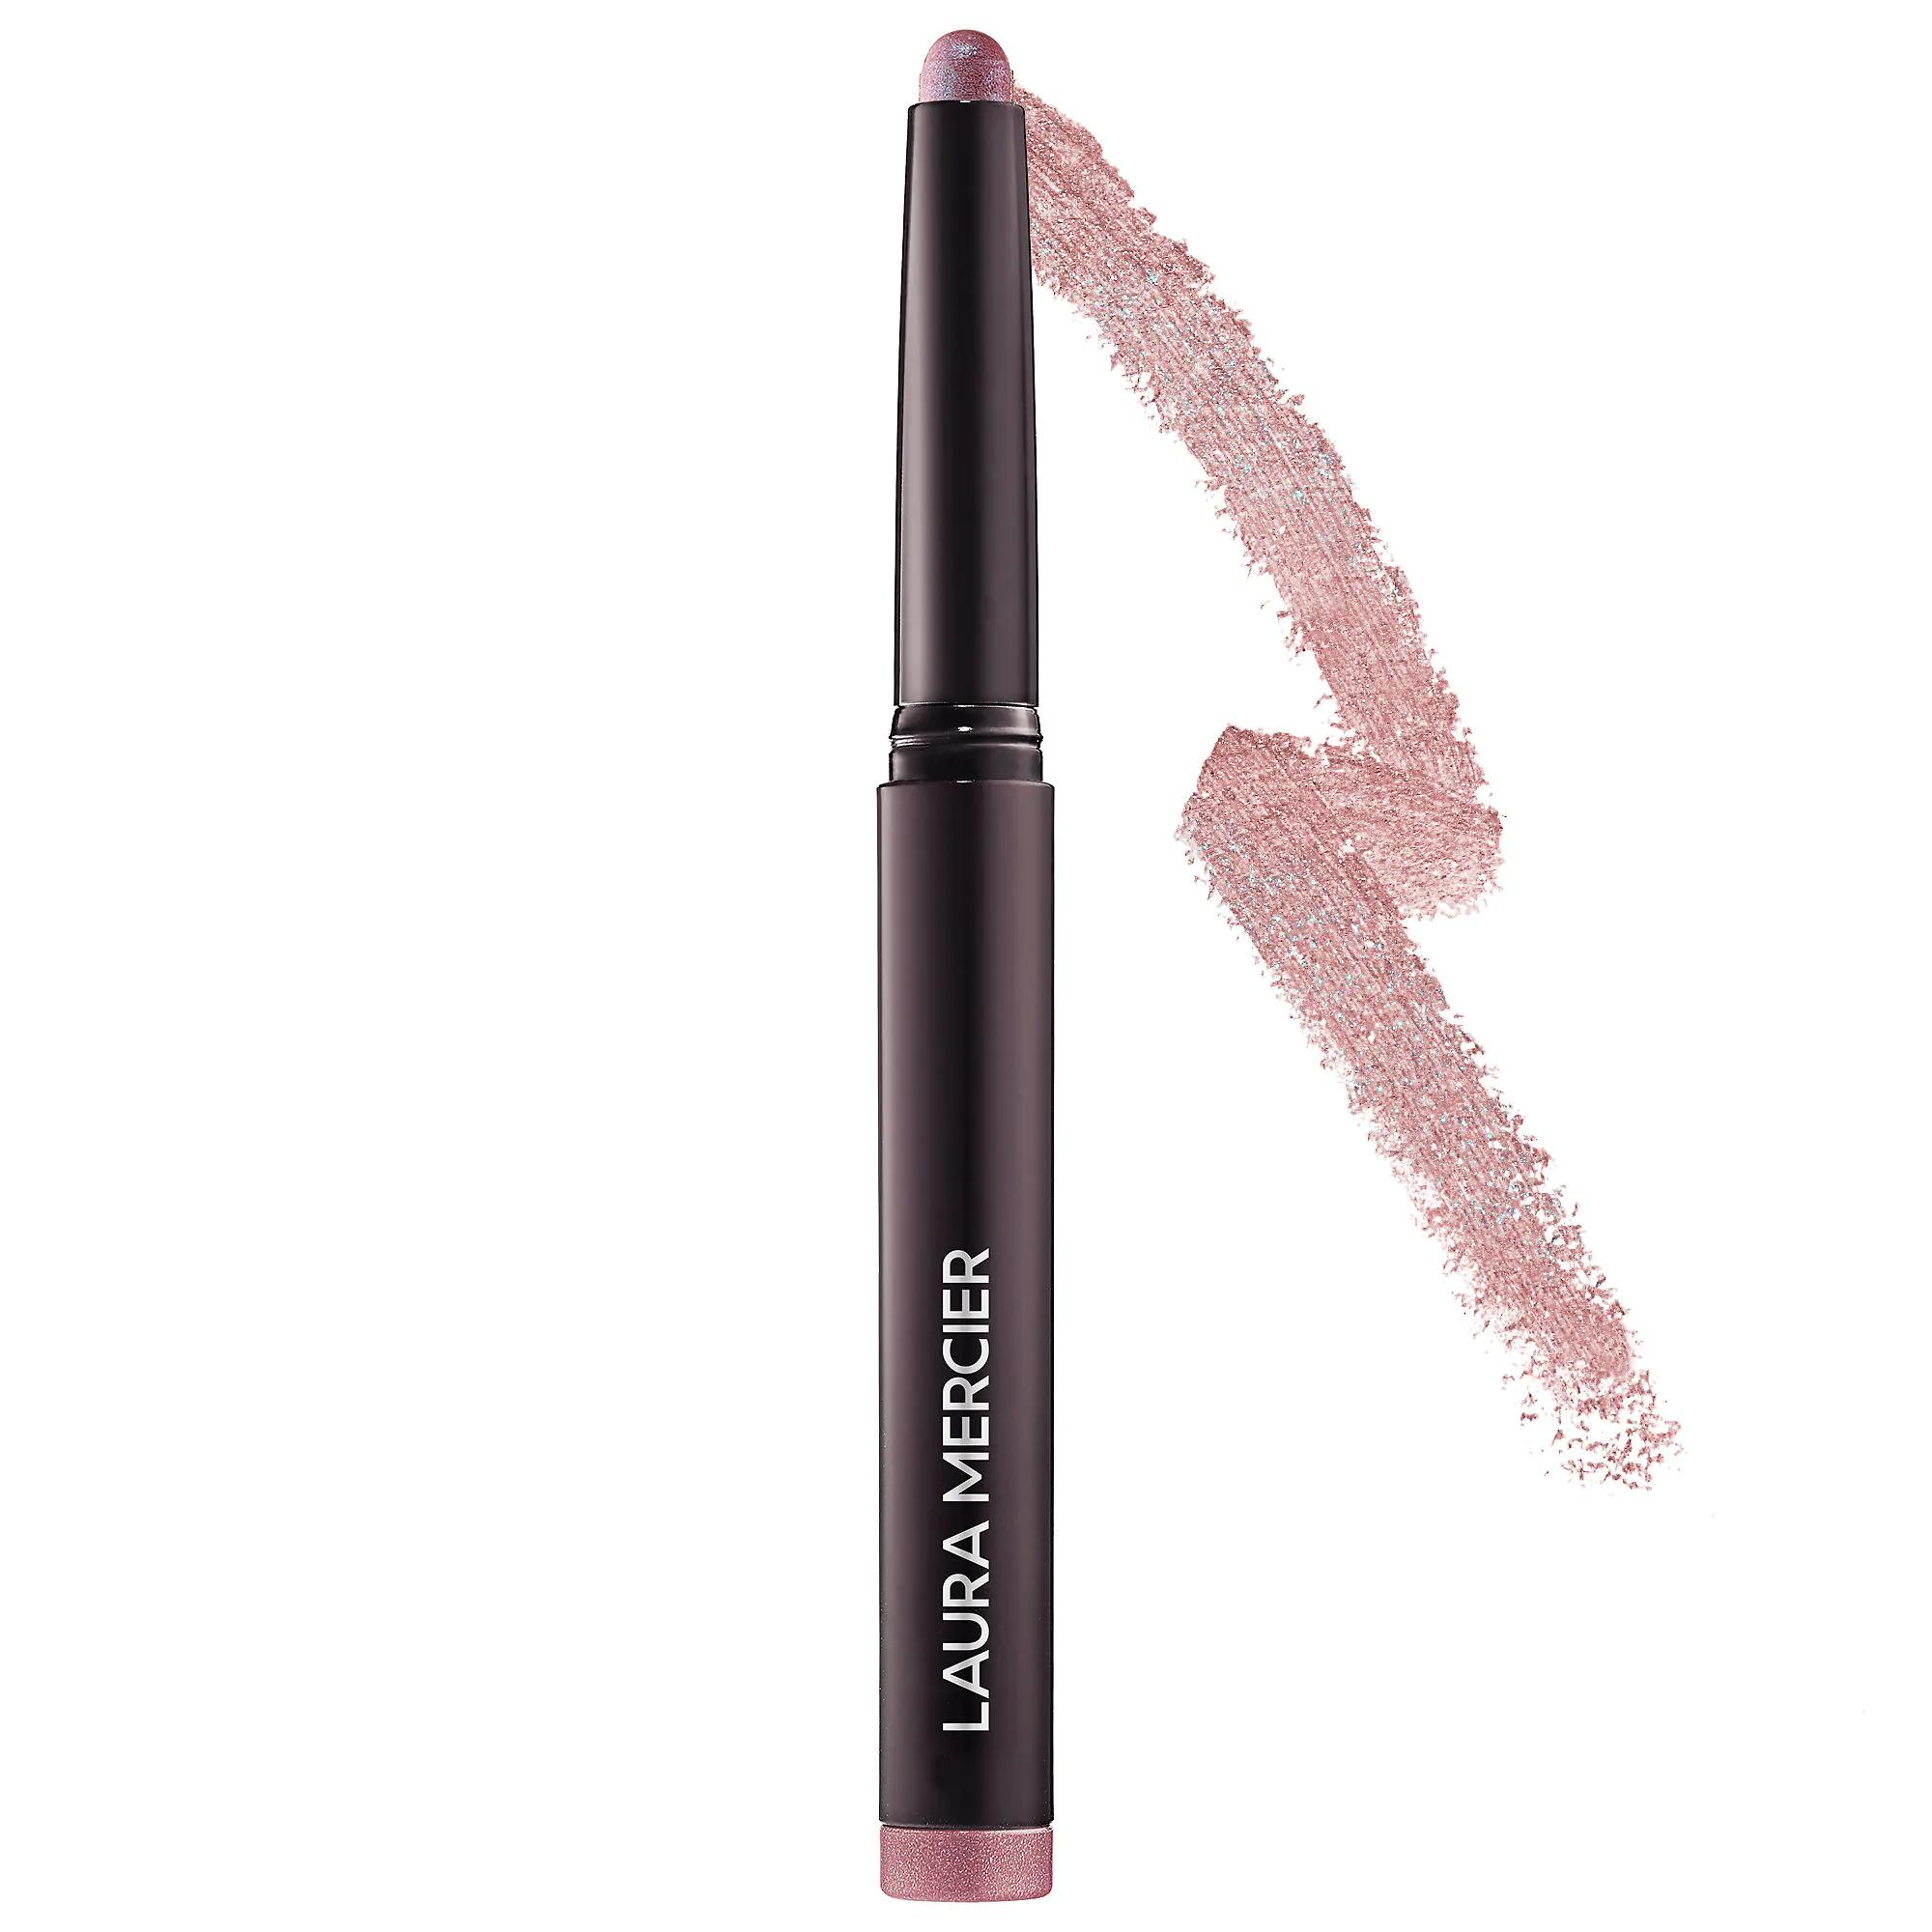 Laura Mercier Caviar Stick Eye Colour Rush